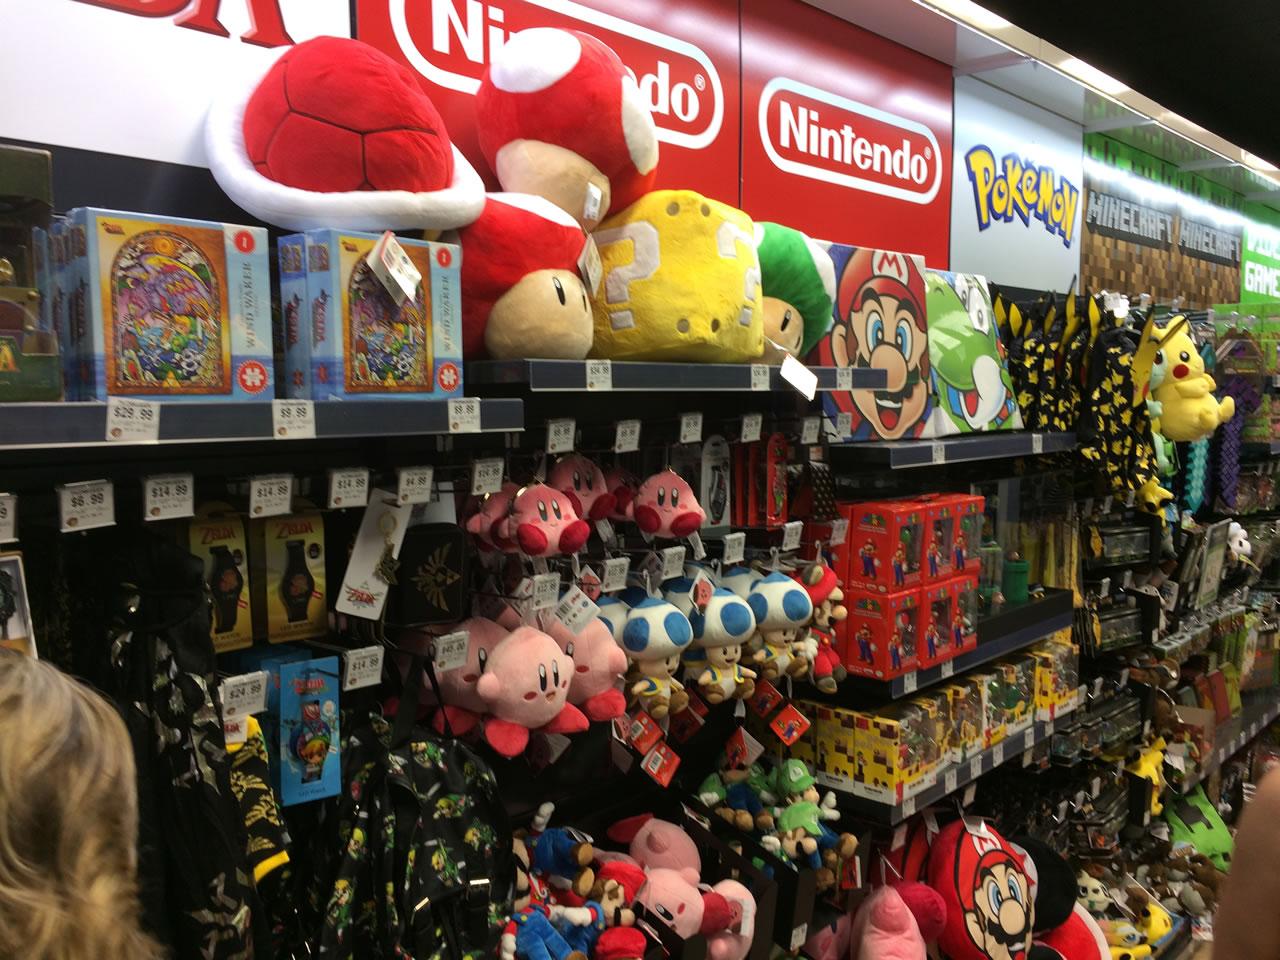 27 thinkgeek store - video games wall 2